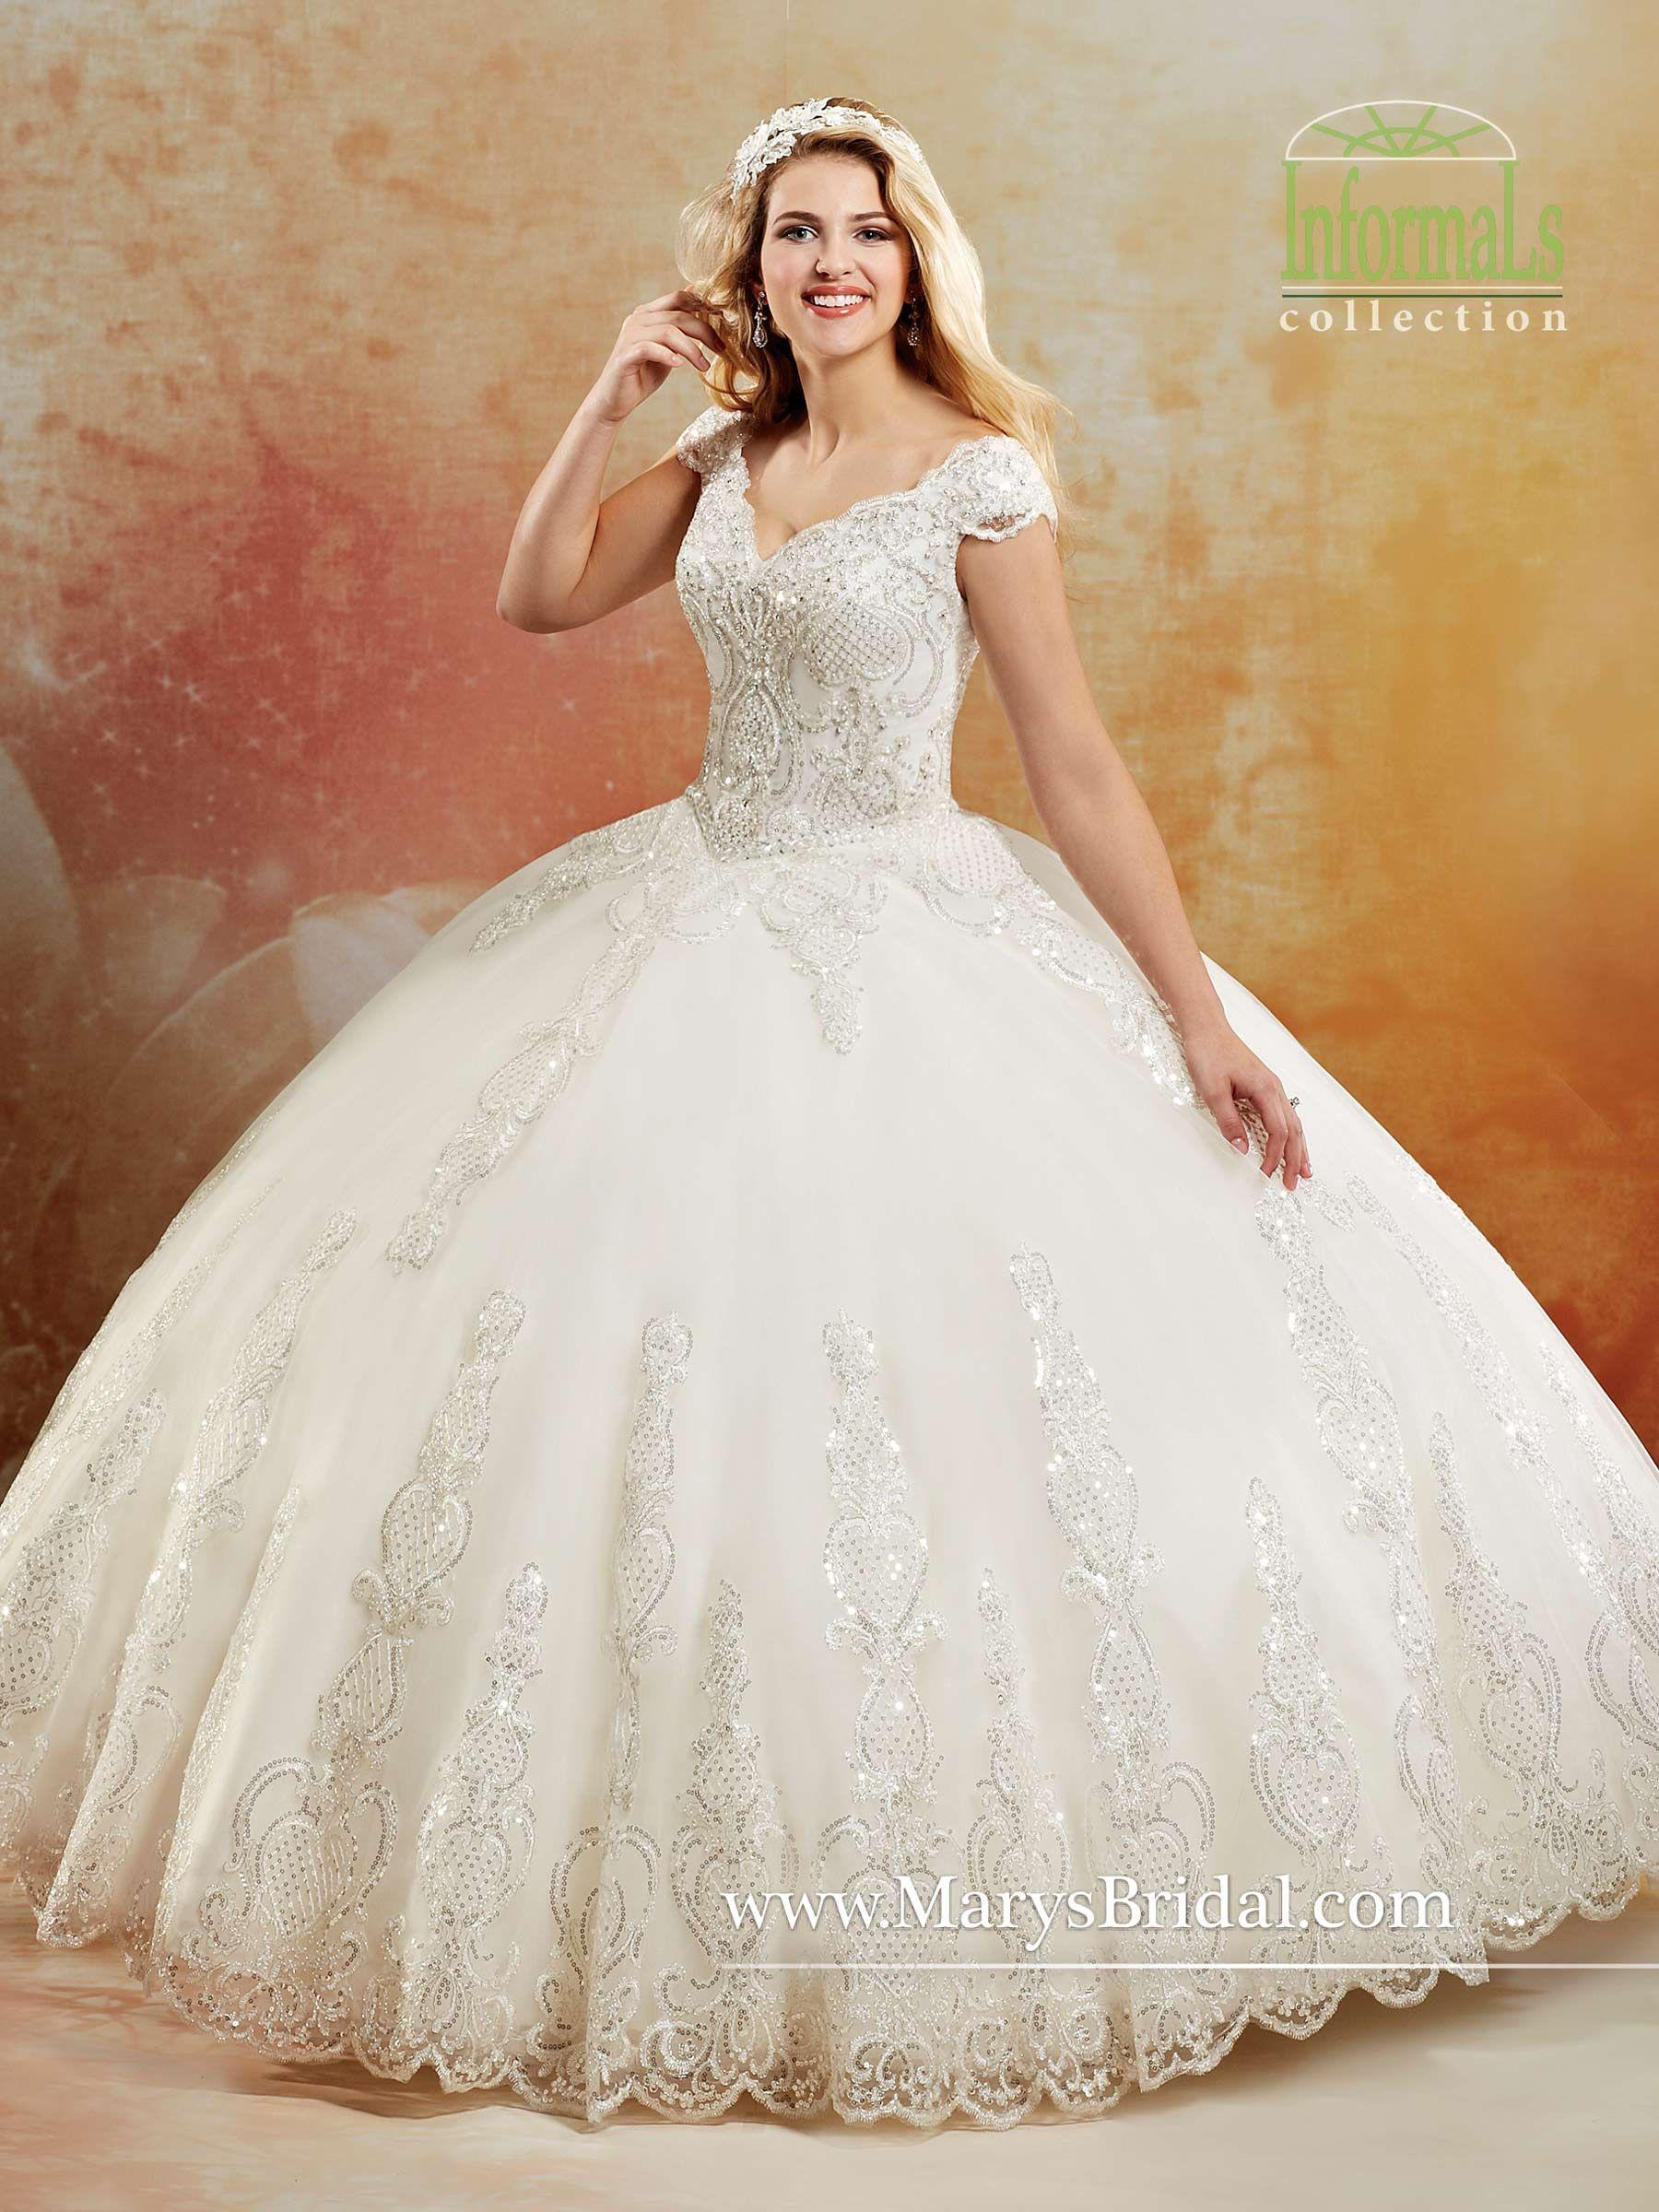 I love this kinda ballroom gown | My Wedding | Pinterest ...